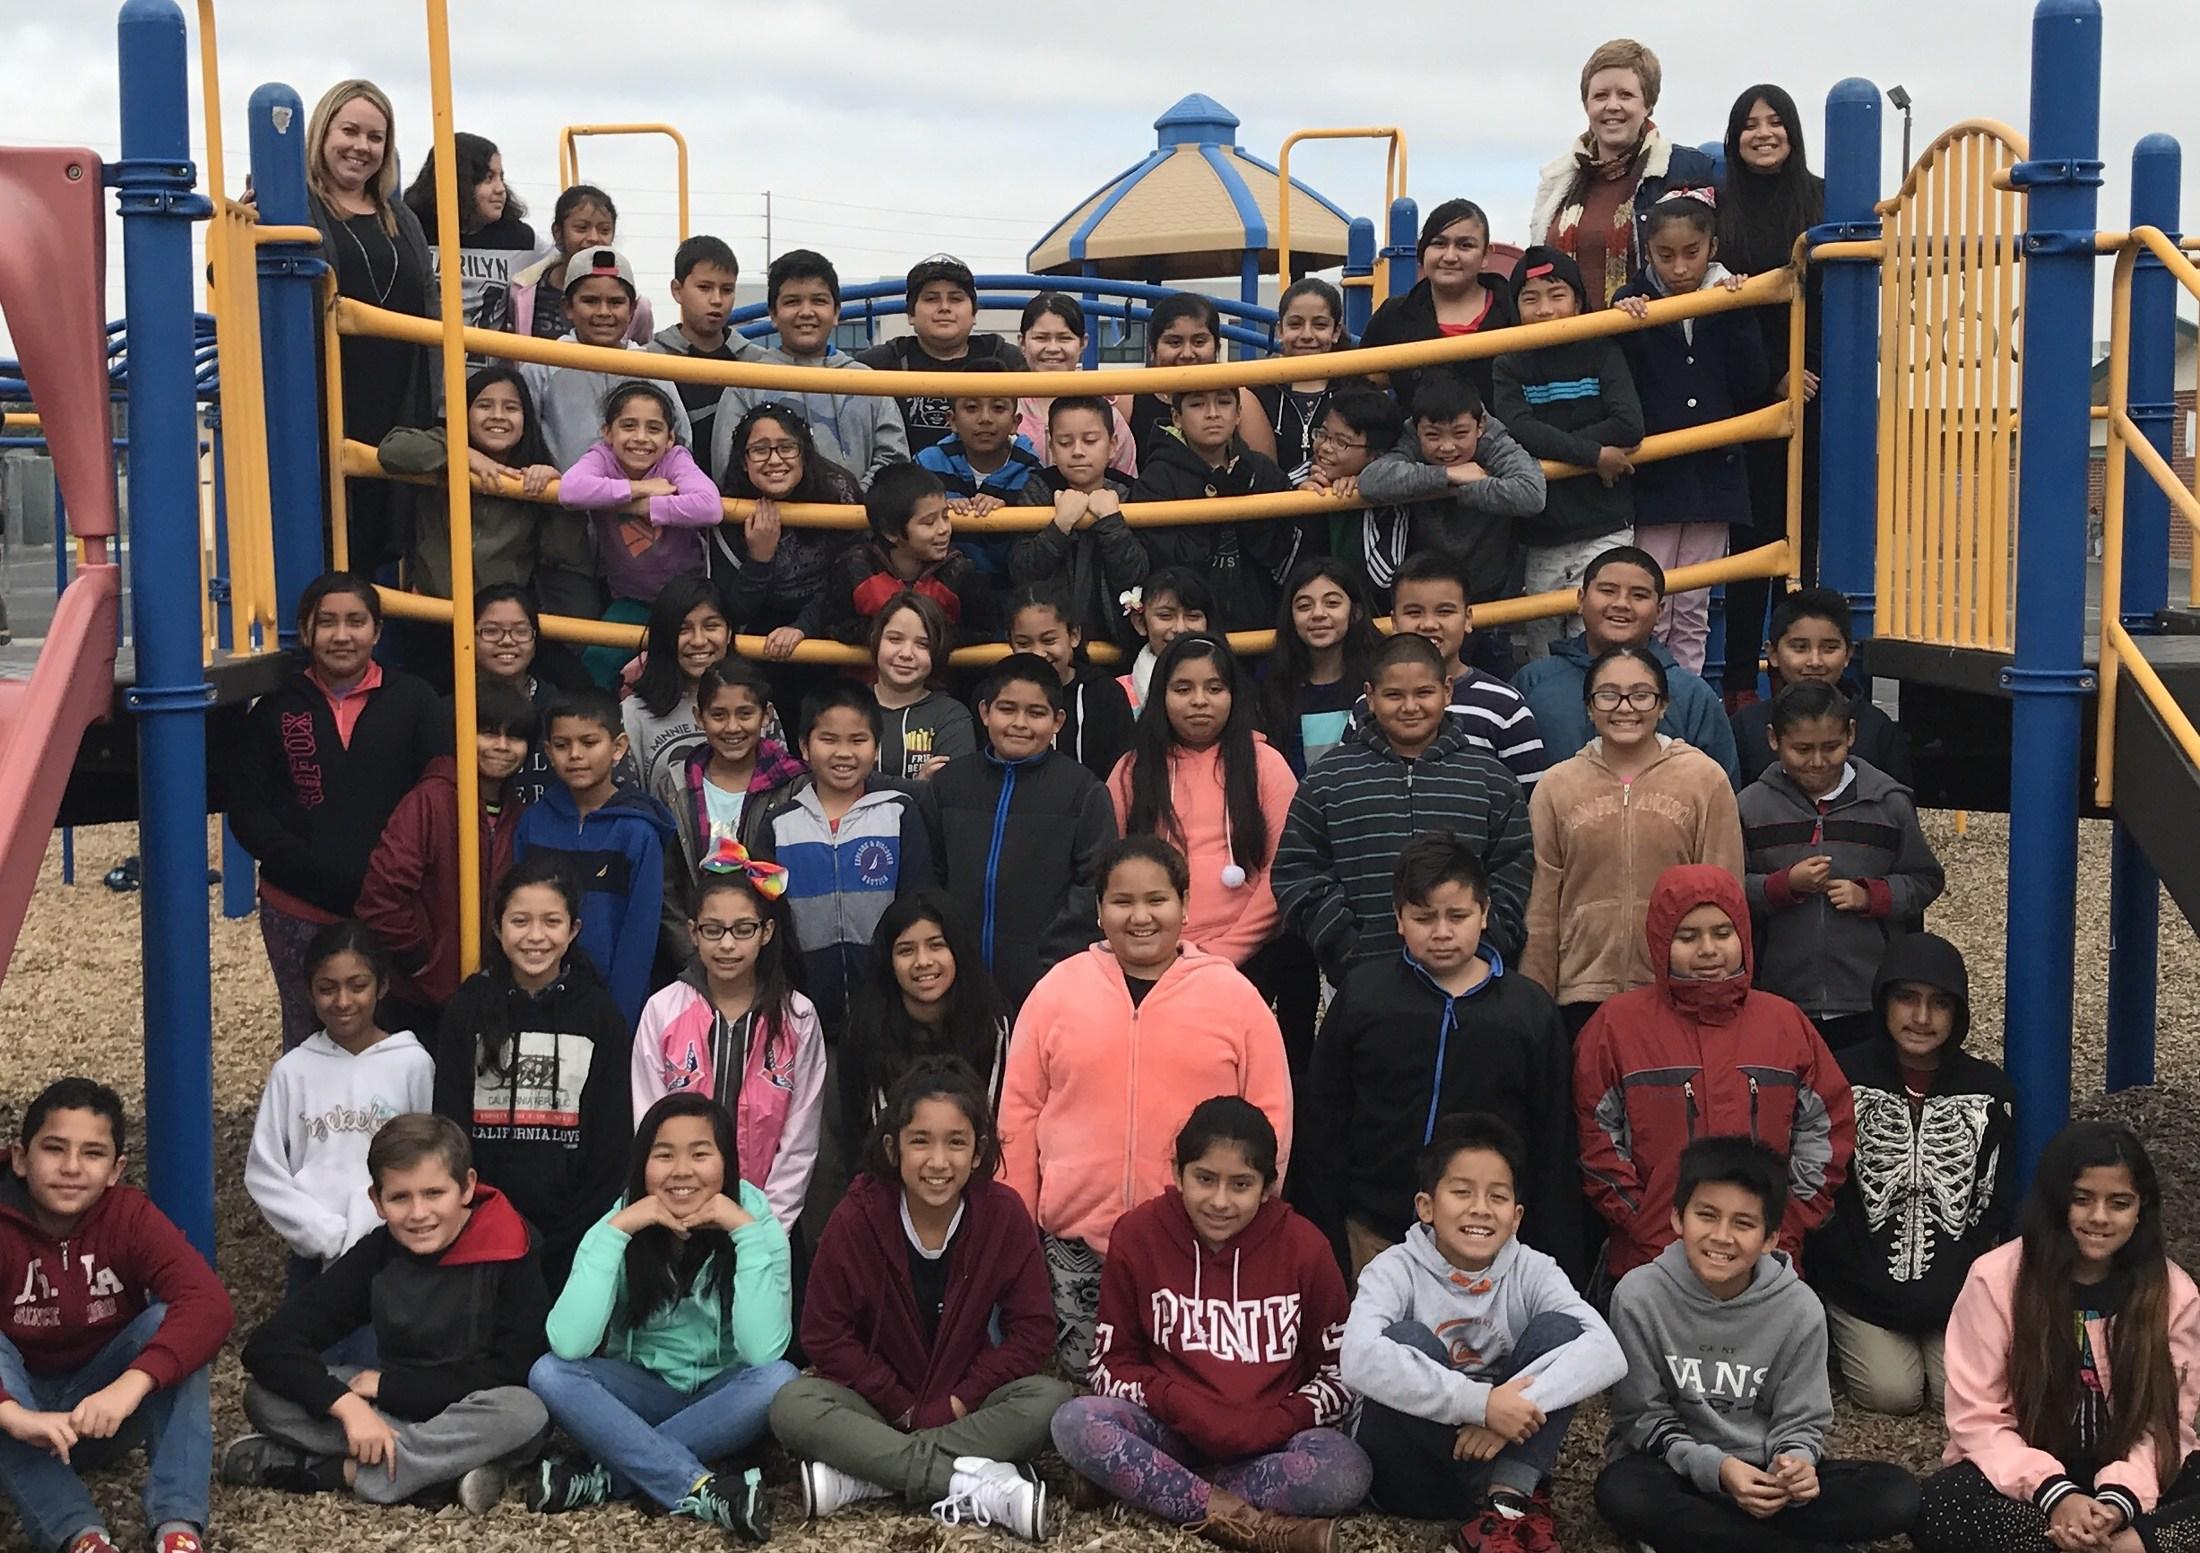 5th grade class of 2016-17